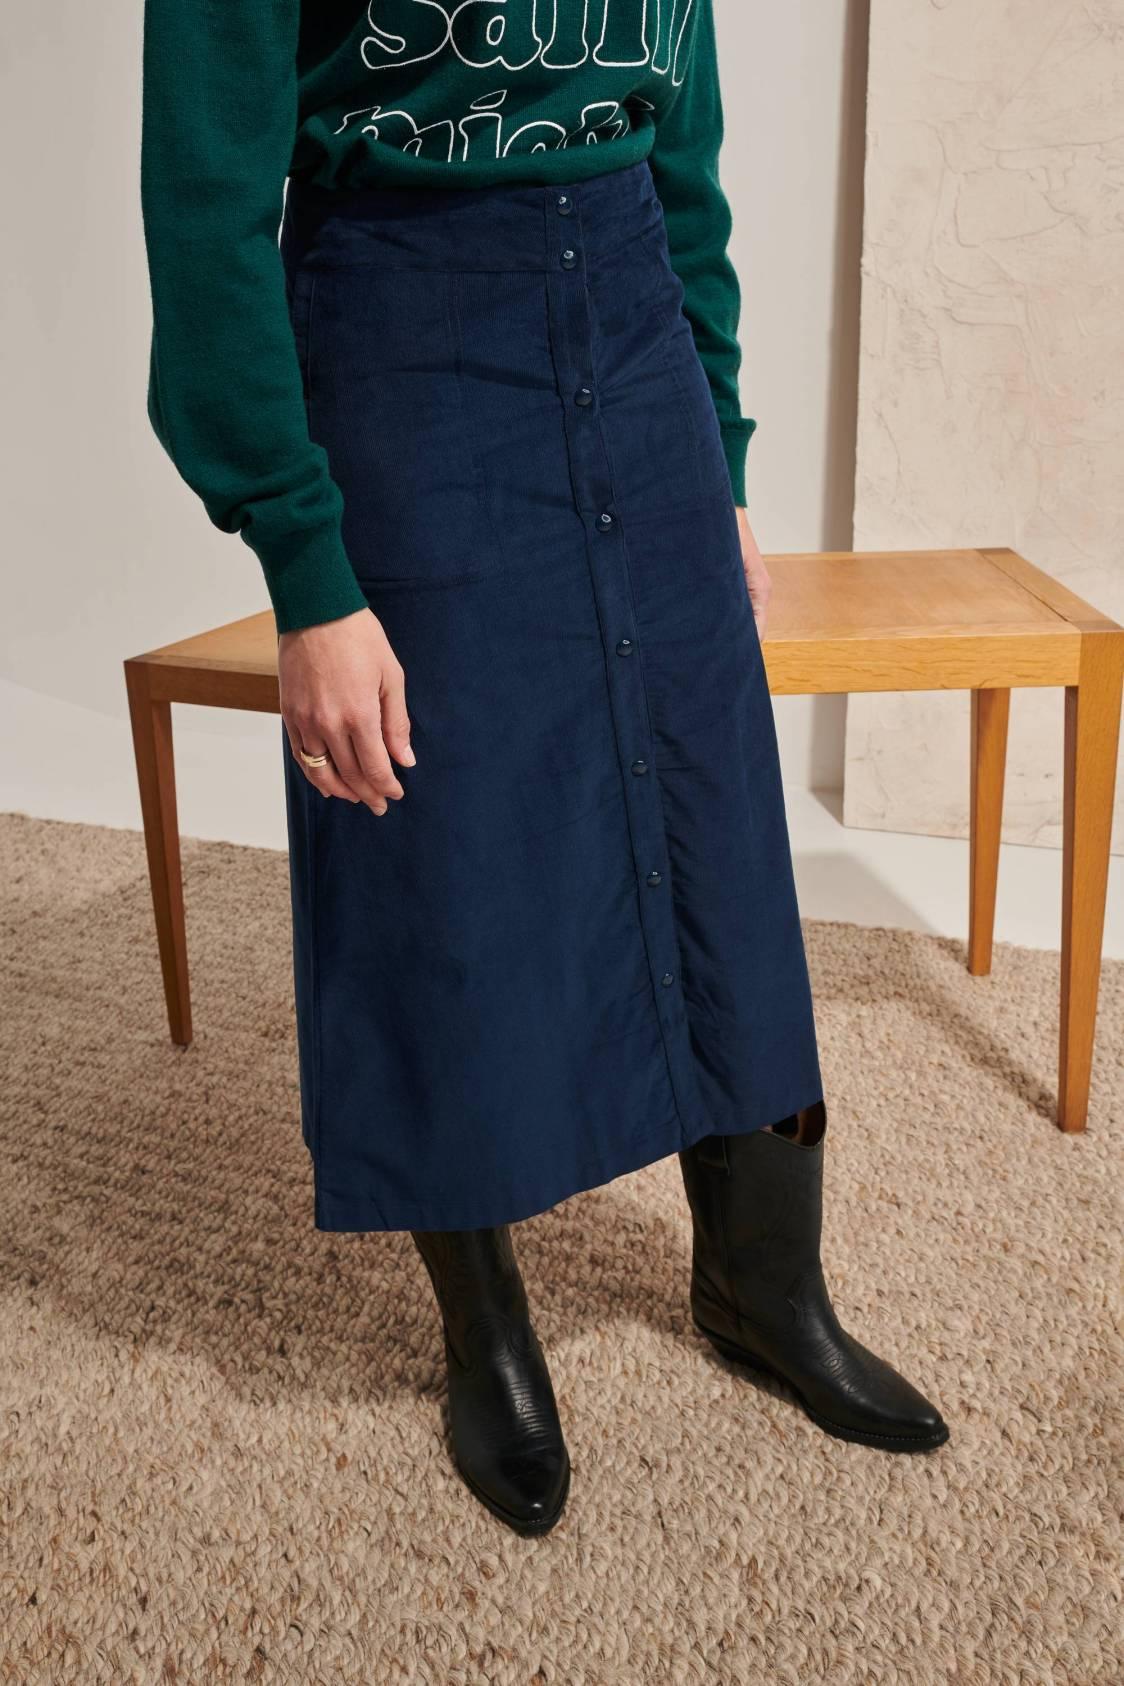 Snap Babycord Skirt